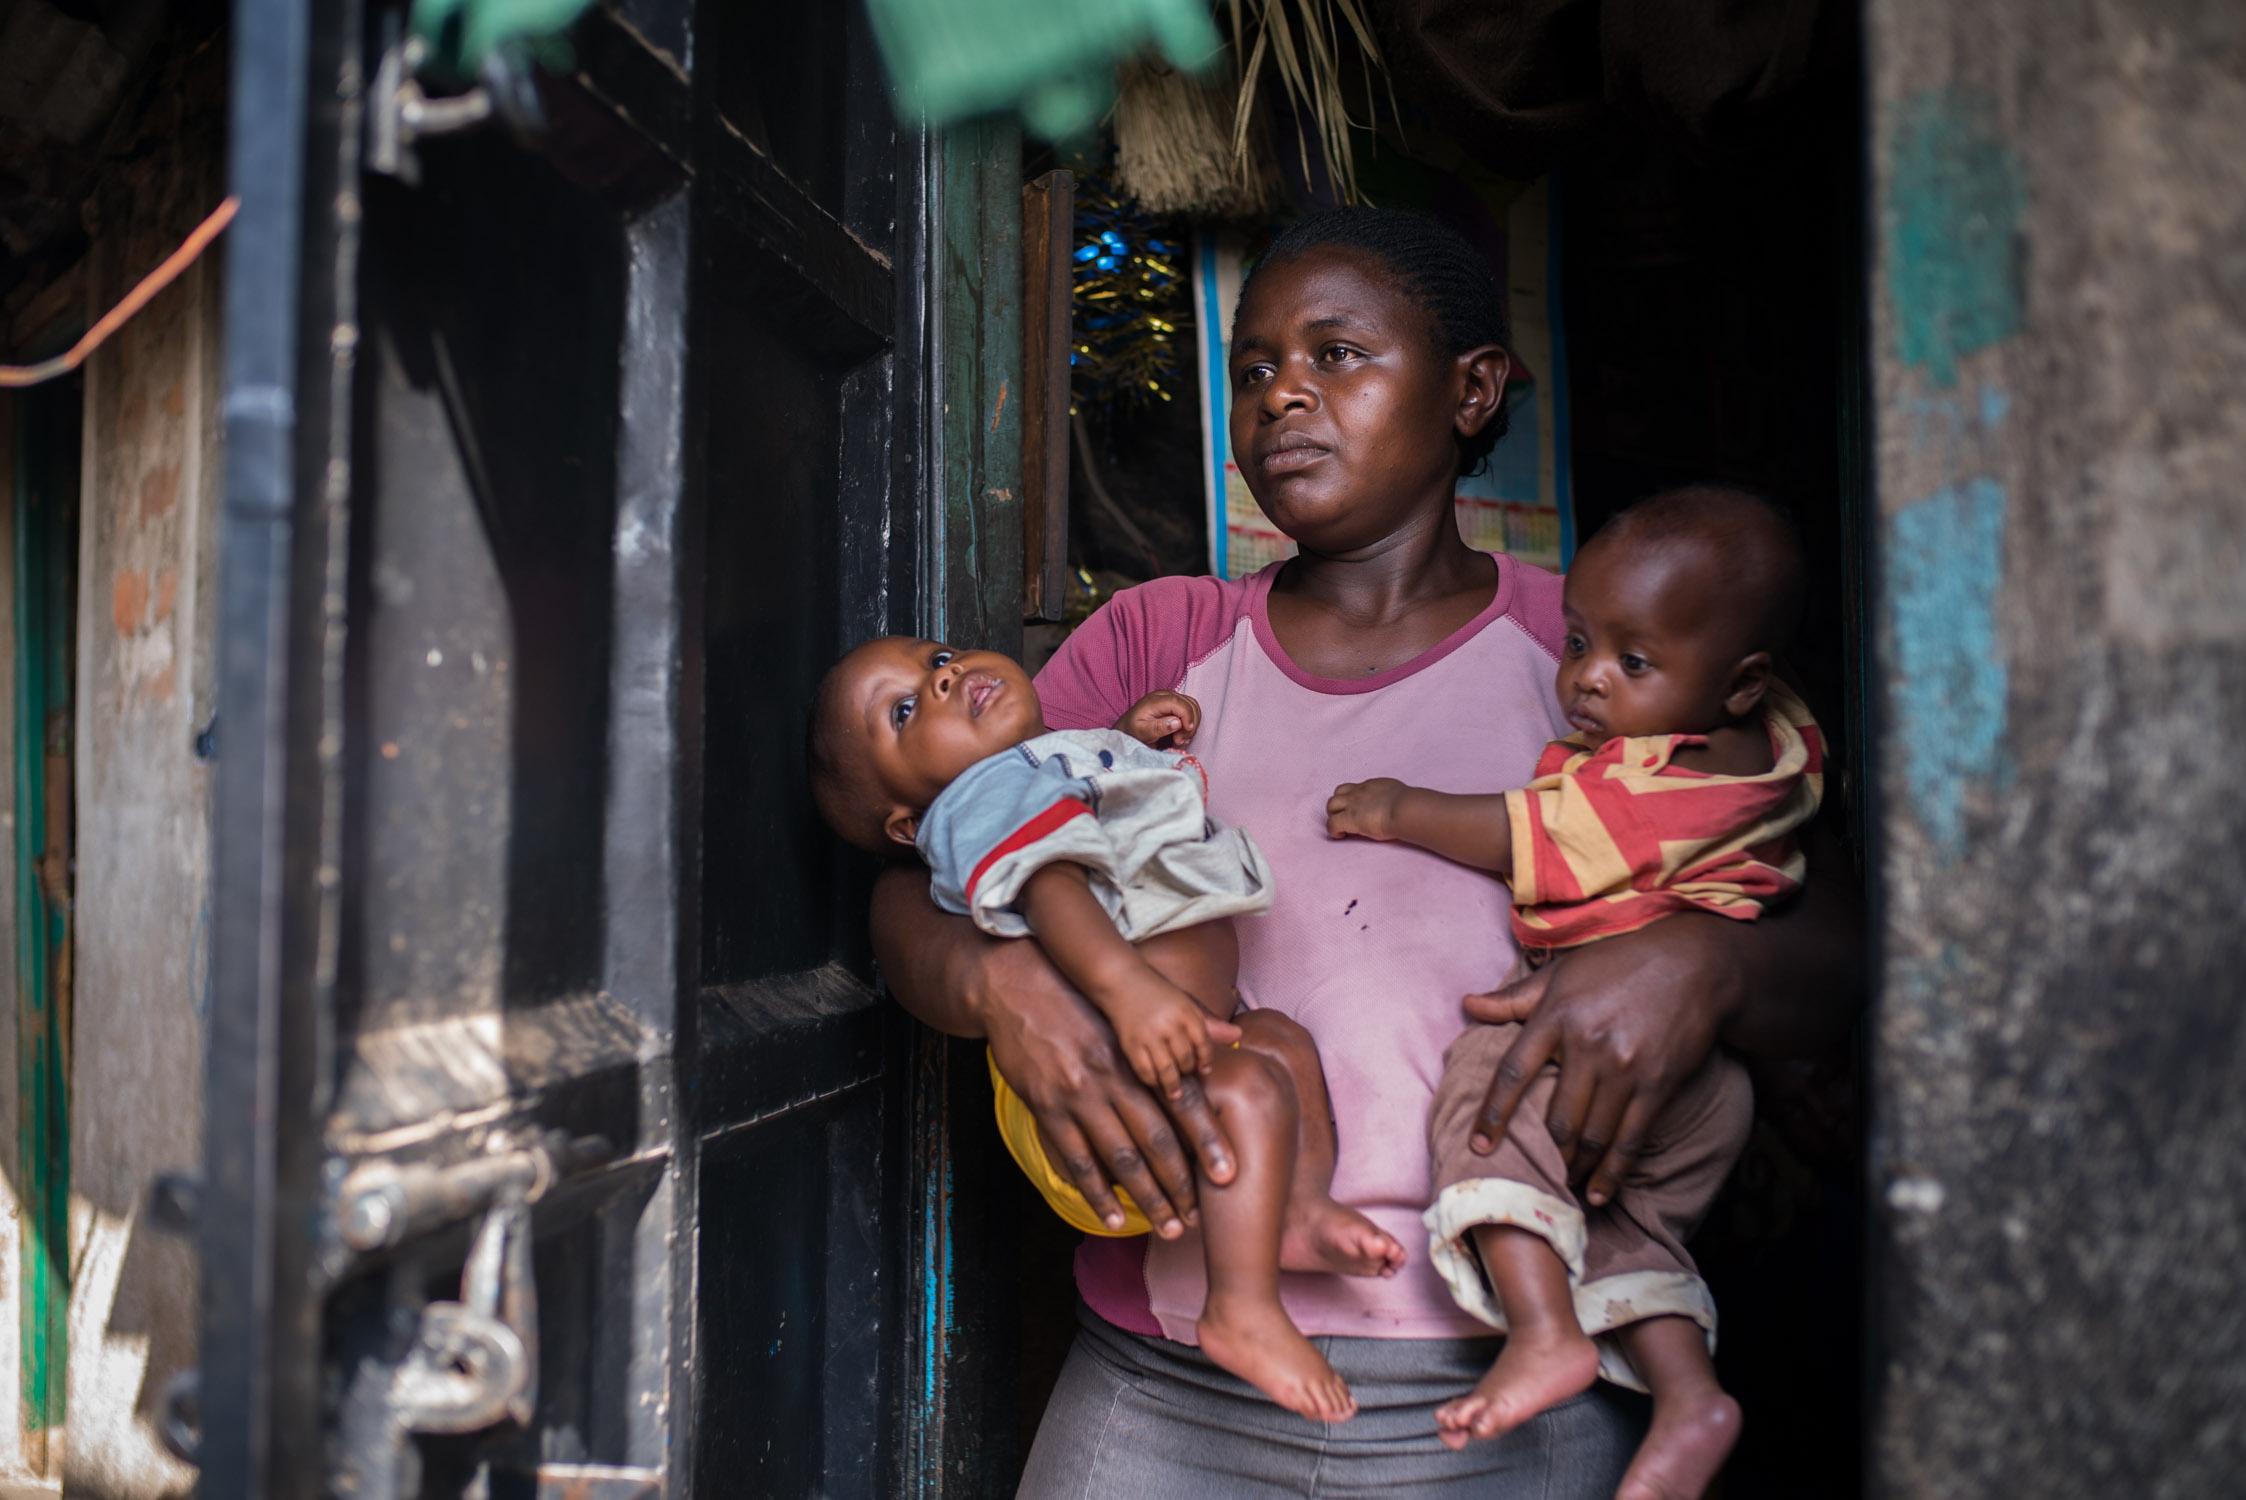 Mathare slum area of Nairobi. September 19, 2016. Nairobi, Kenya.